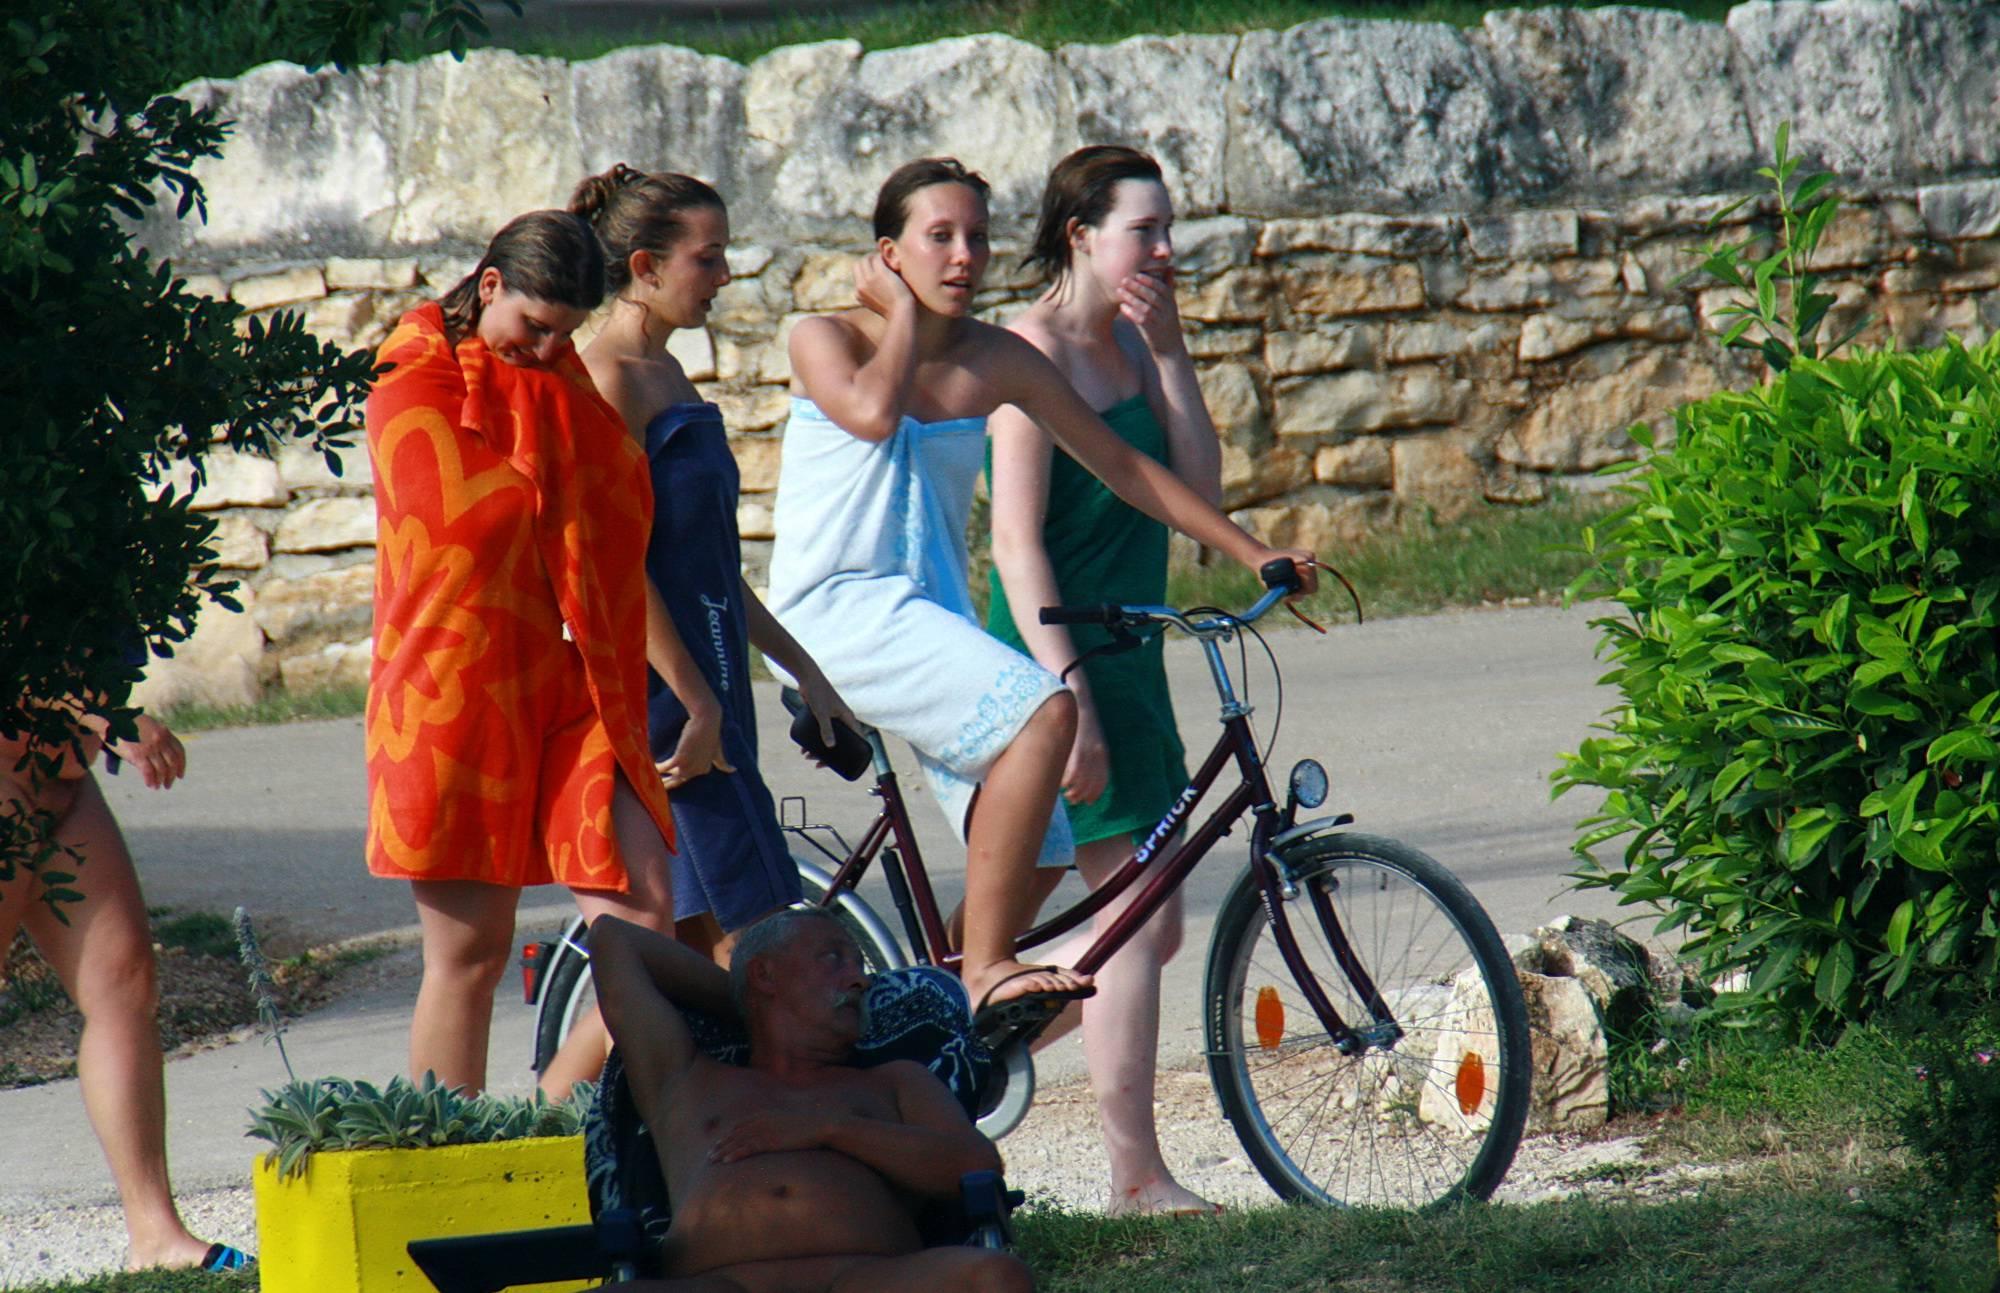 Nudist Photos Colorful Towel Sun Drying - 2